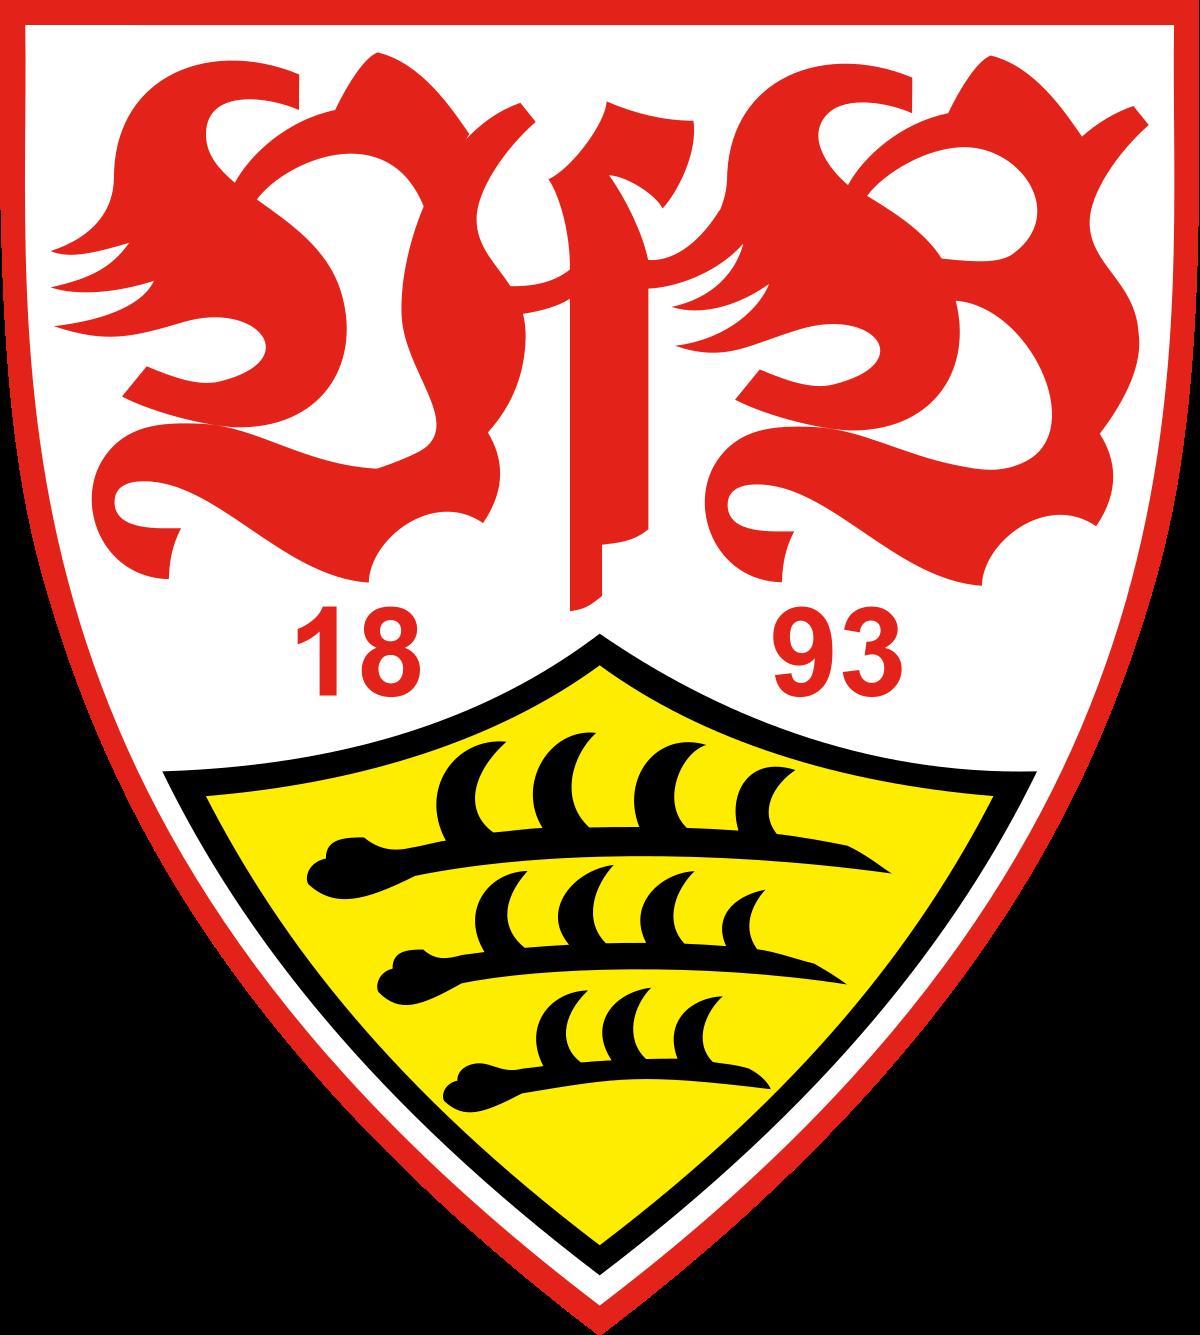 Vfb Stuttgart Wikipedia Stuttgart Germany Football Football Team Logos